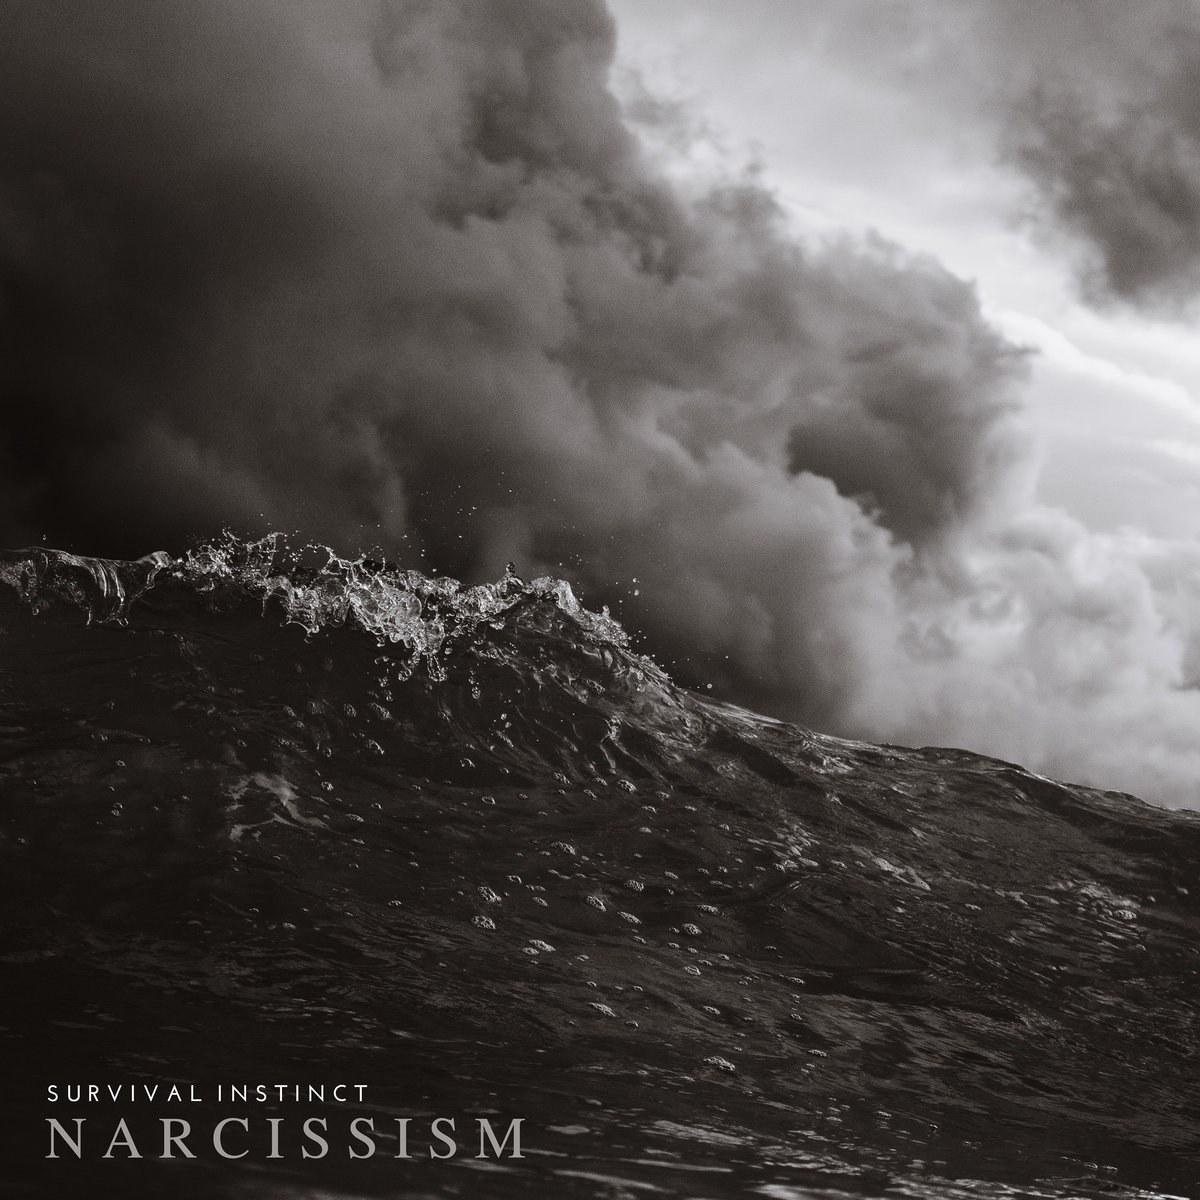 Review for Narcissism - Survival Instinct